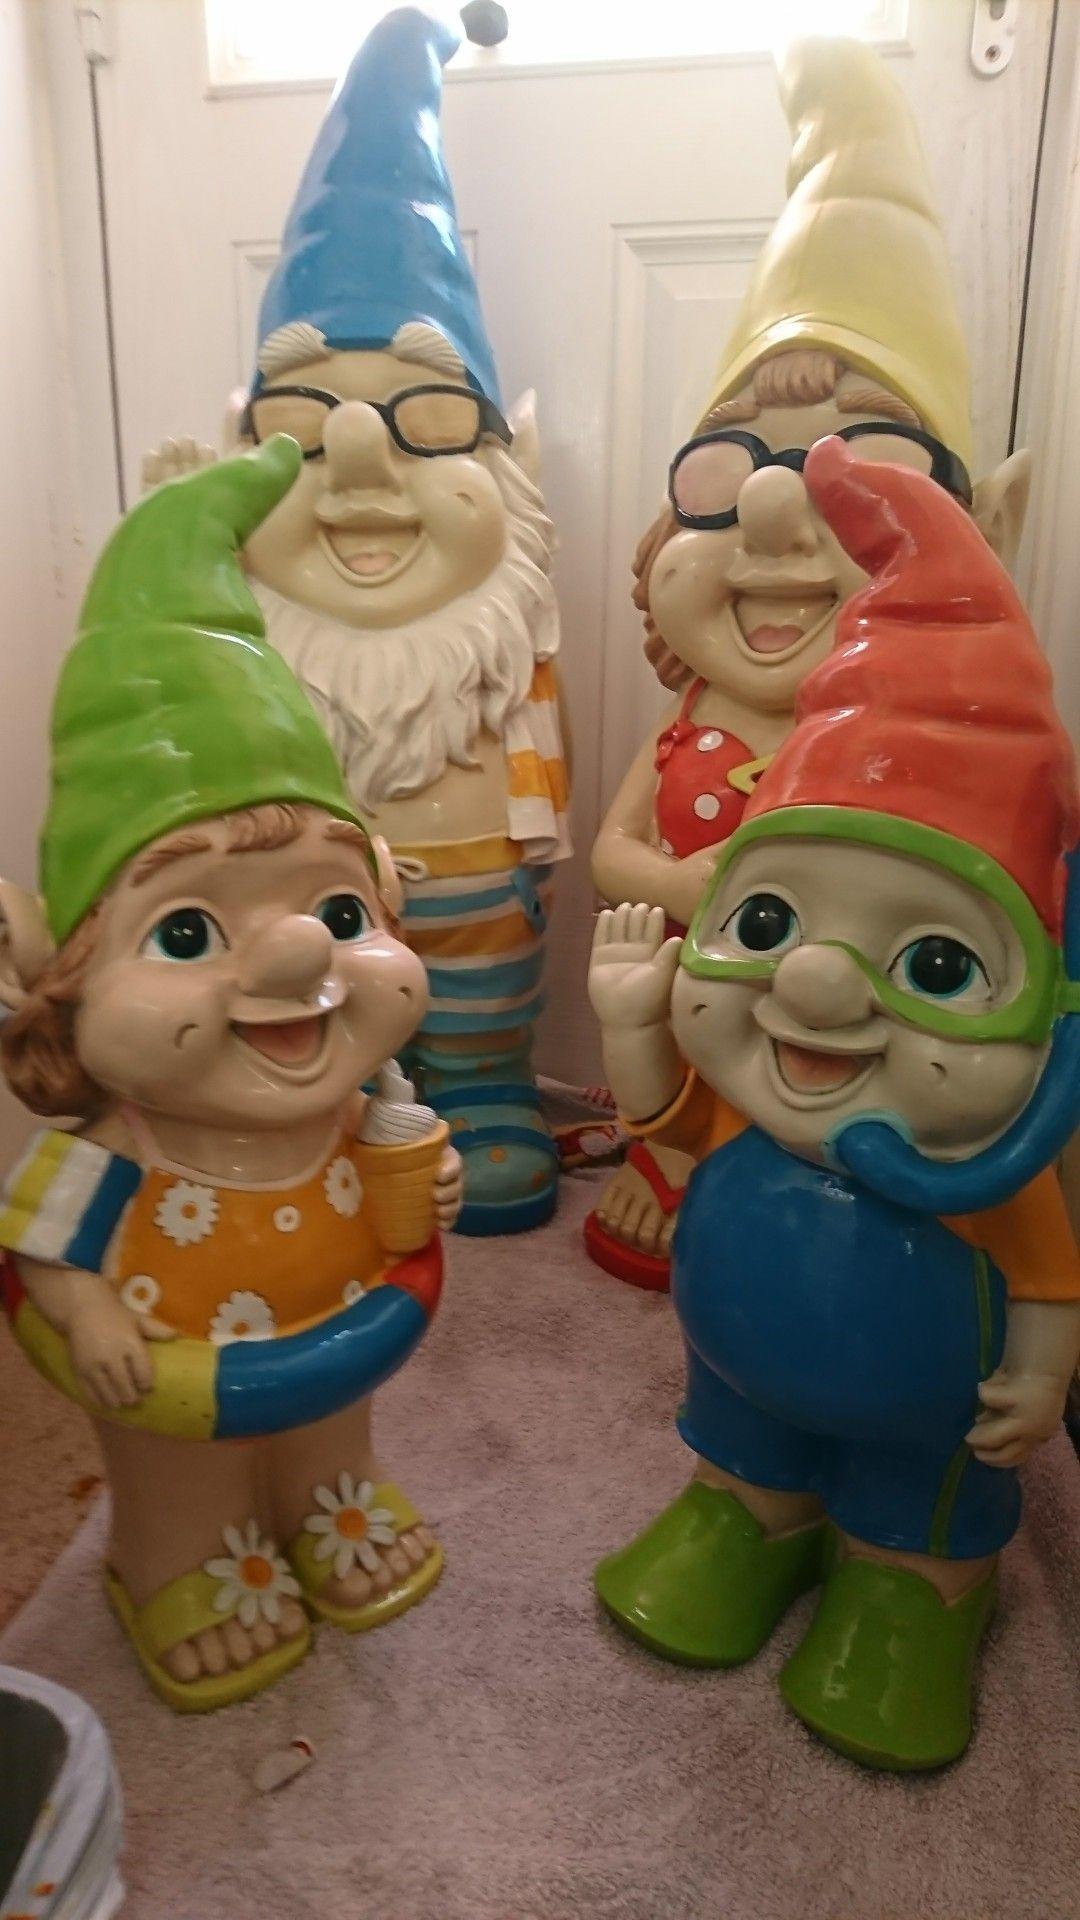 Asda gnomes image by Allison D on Gnomes Gnomes, Gnome